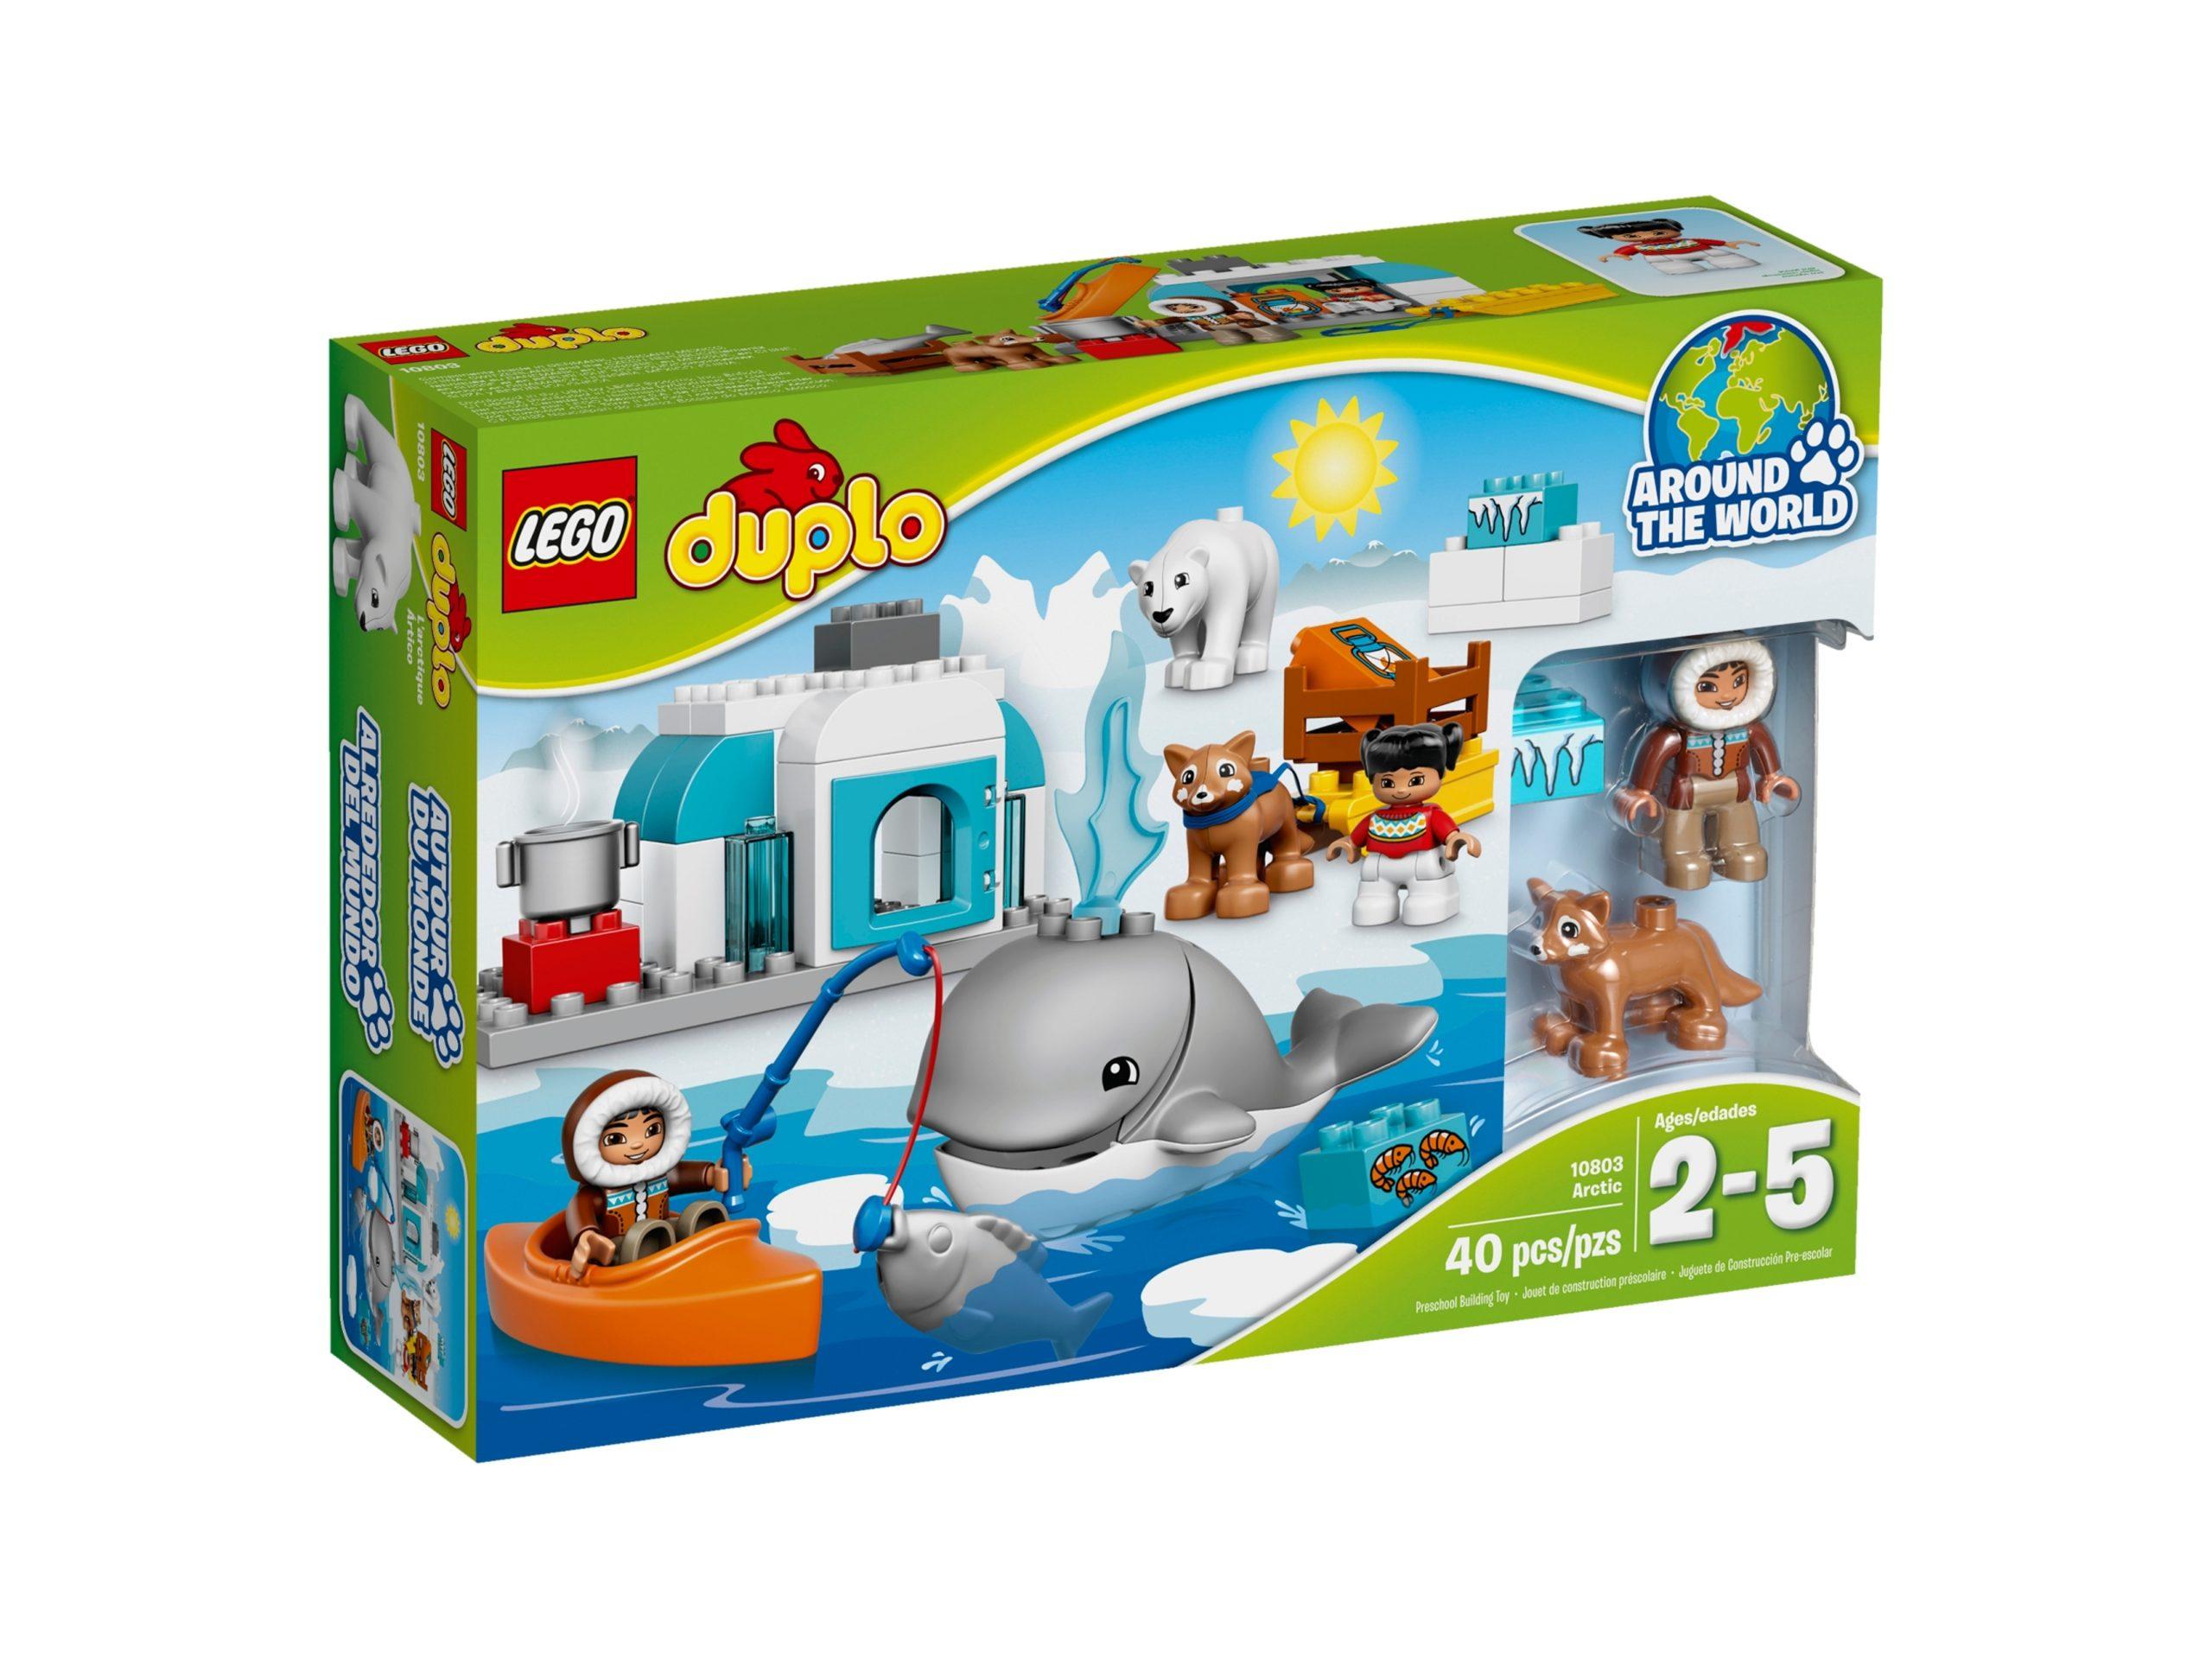 lego 10803 arktis scaled